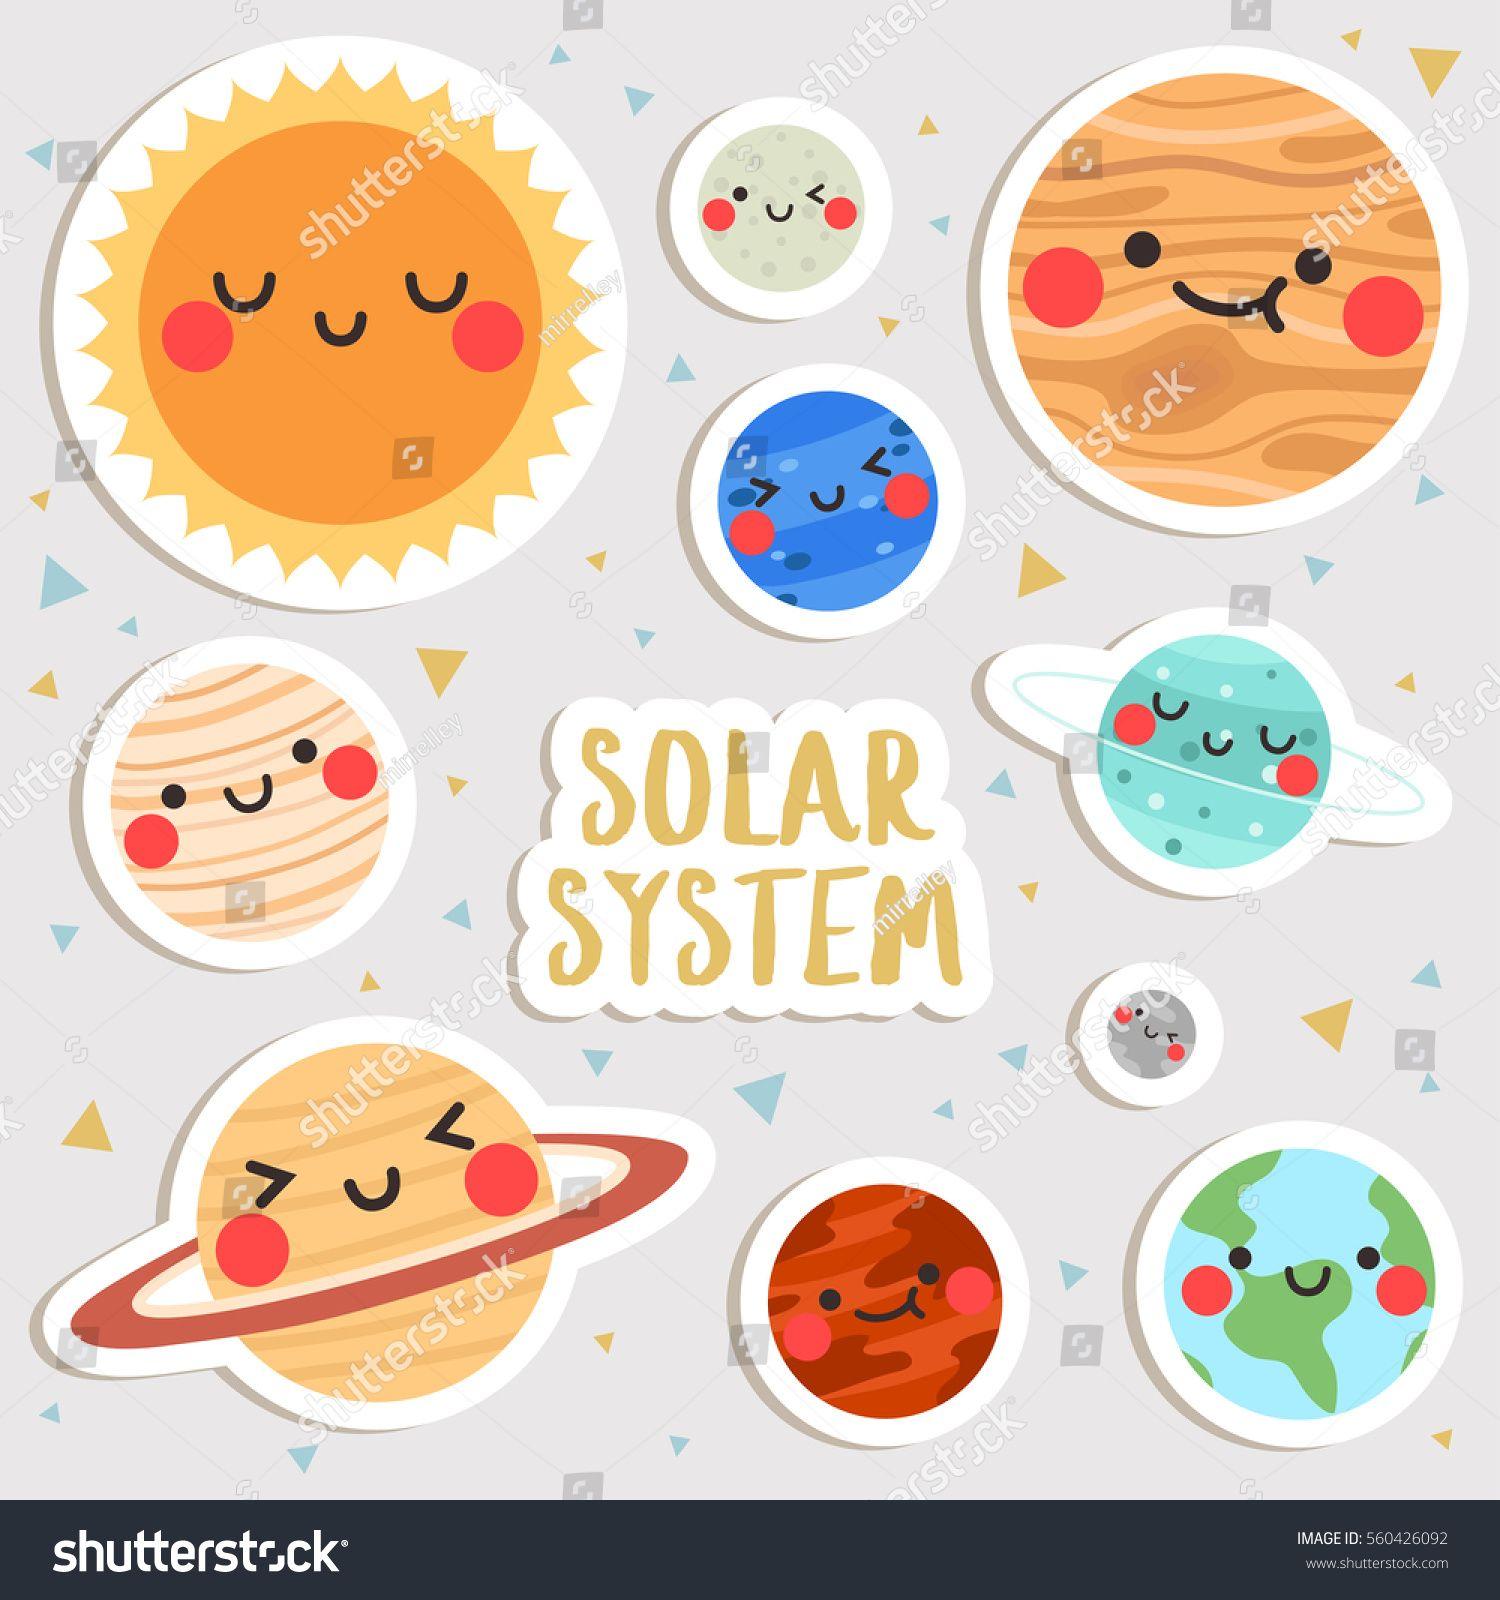 Planet cute. Big set of cartoon